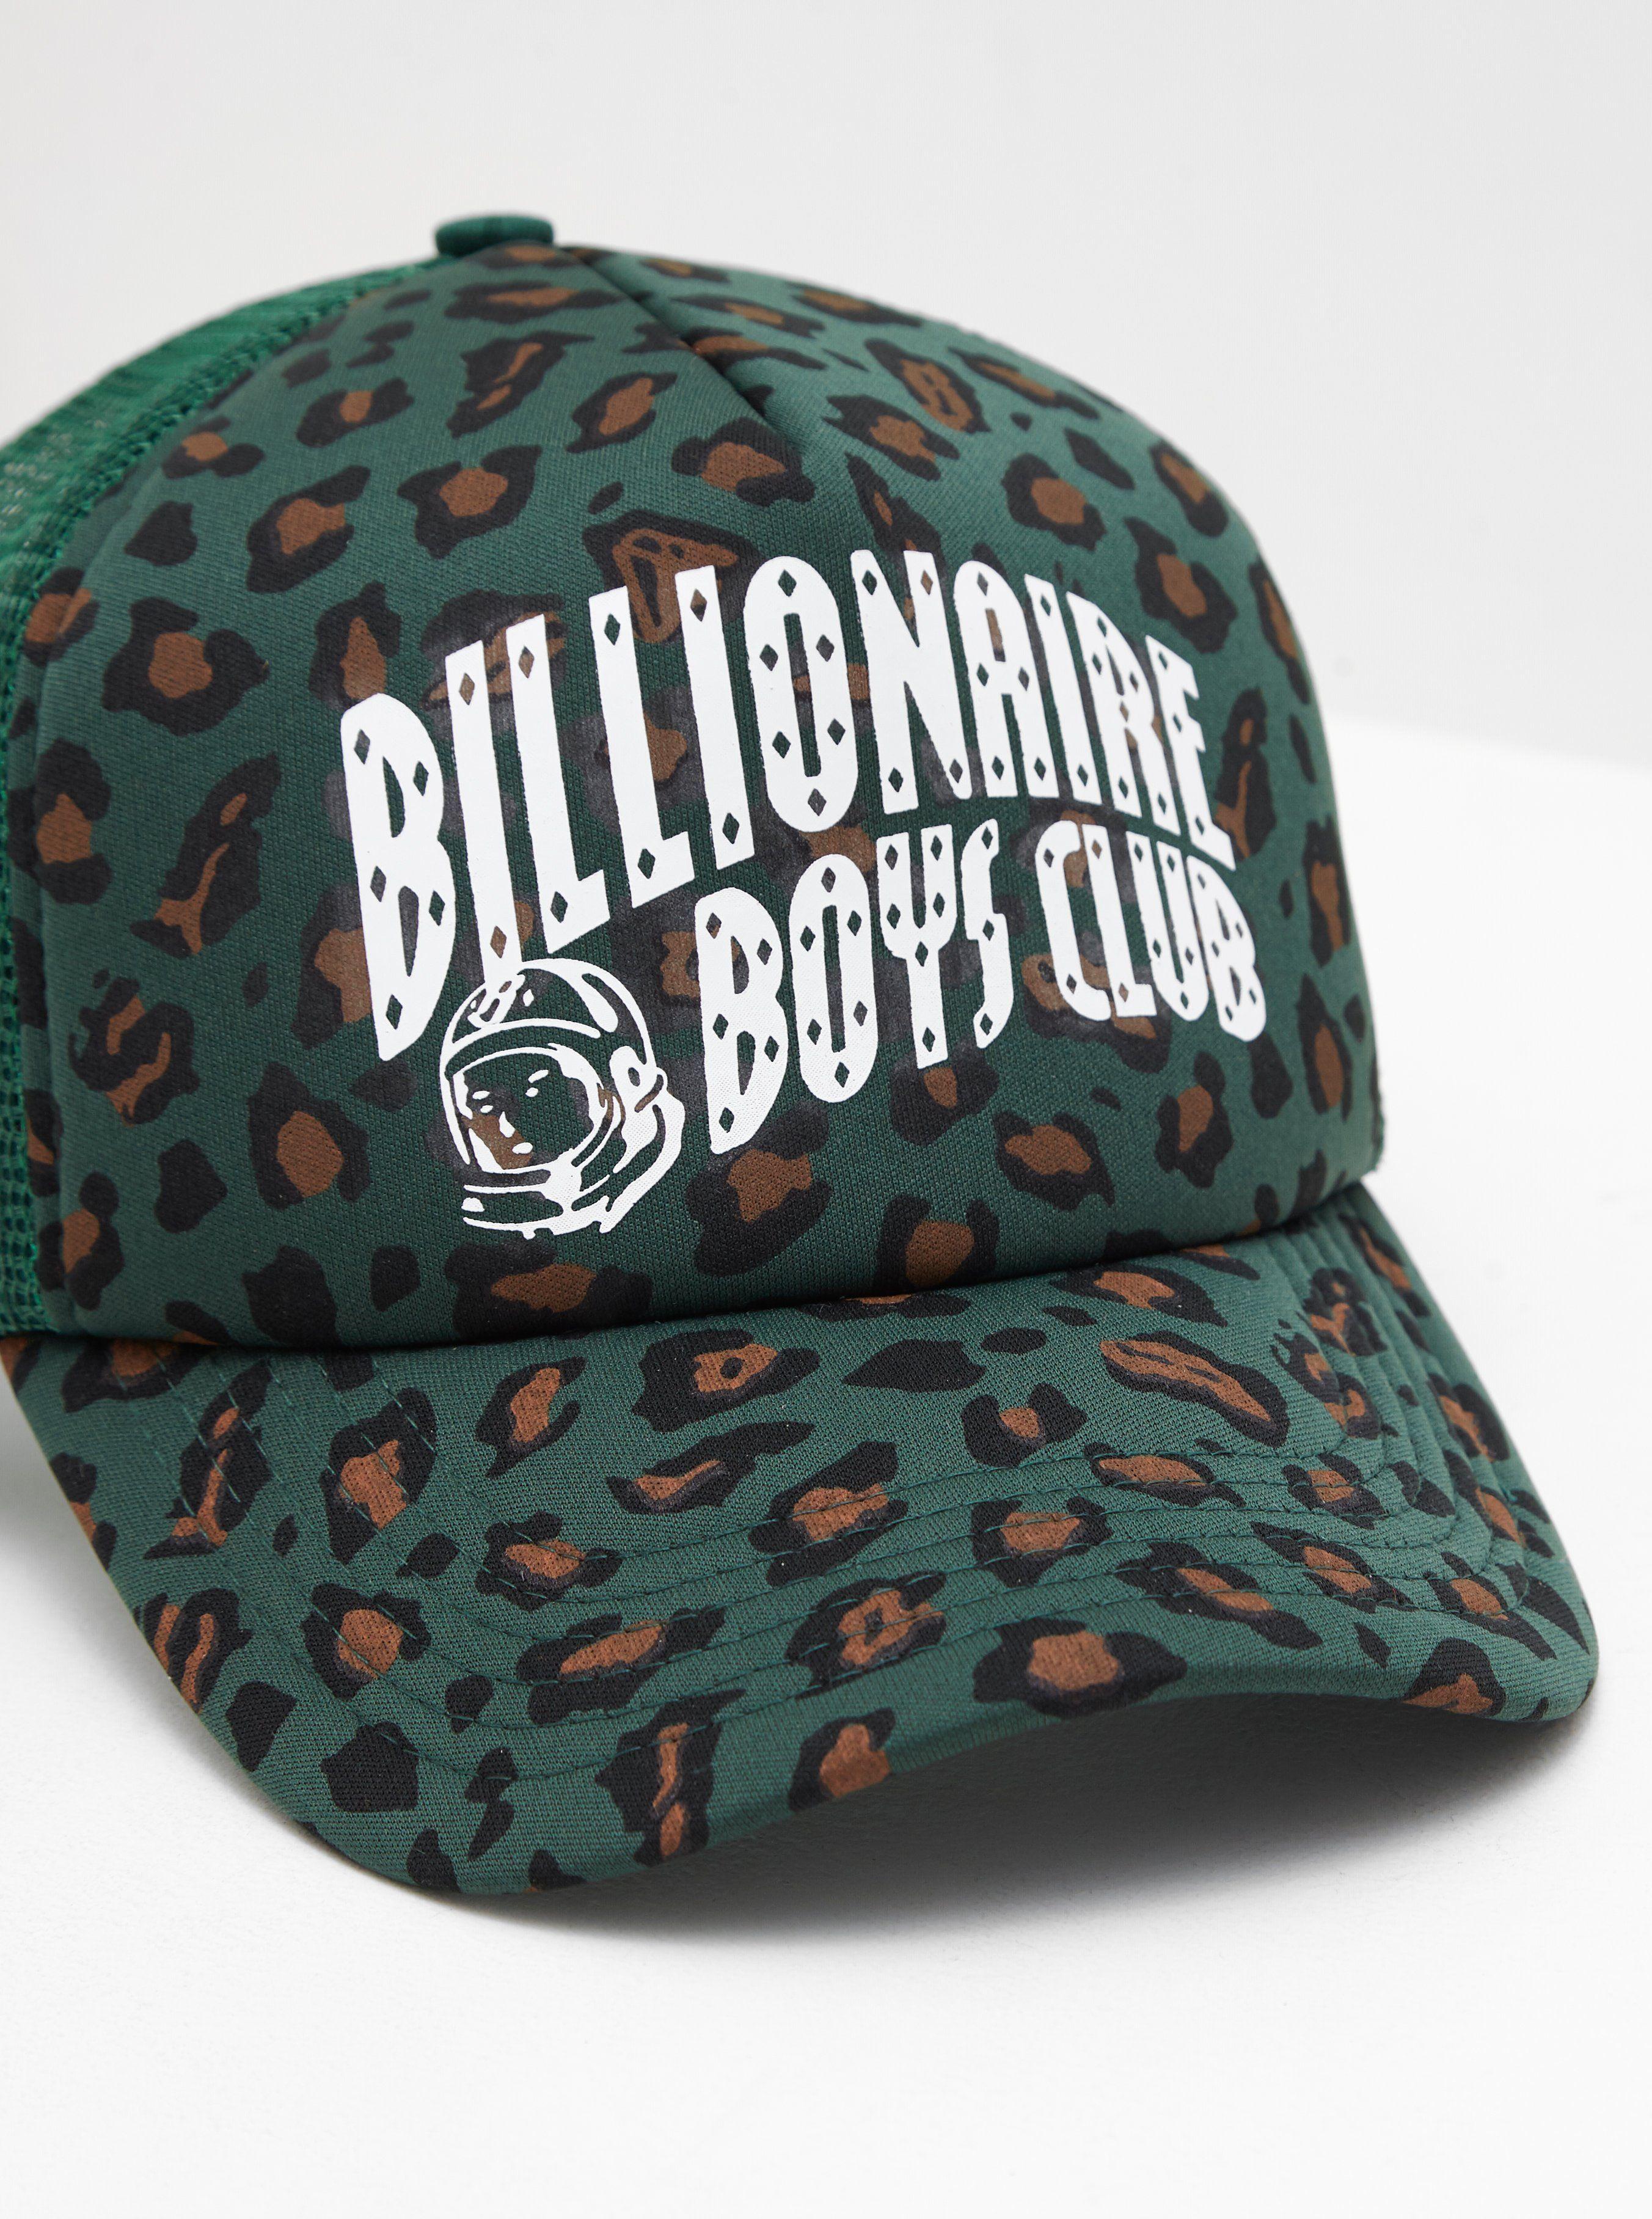 Billionaire Boys Club Leopard Trucker Cap